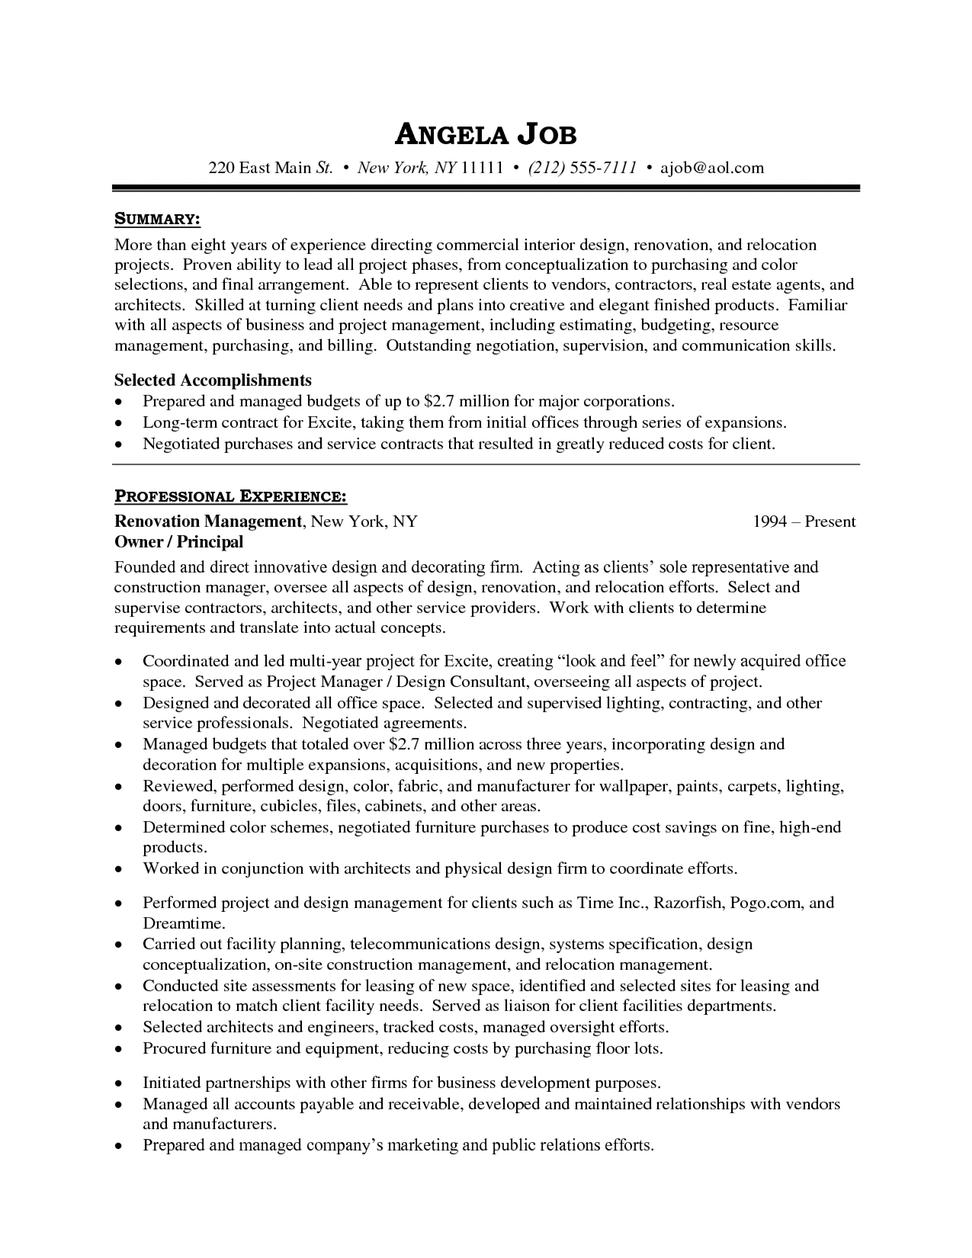 010 Adoption Essay Persuasive Speech Outline Topics Personal Interior Design Assistant Resume Example Websites Career